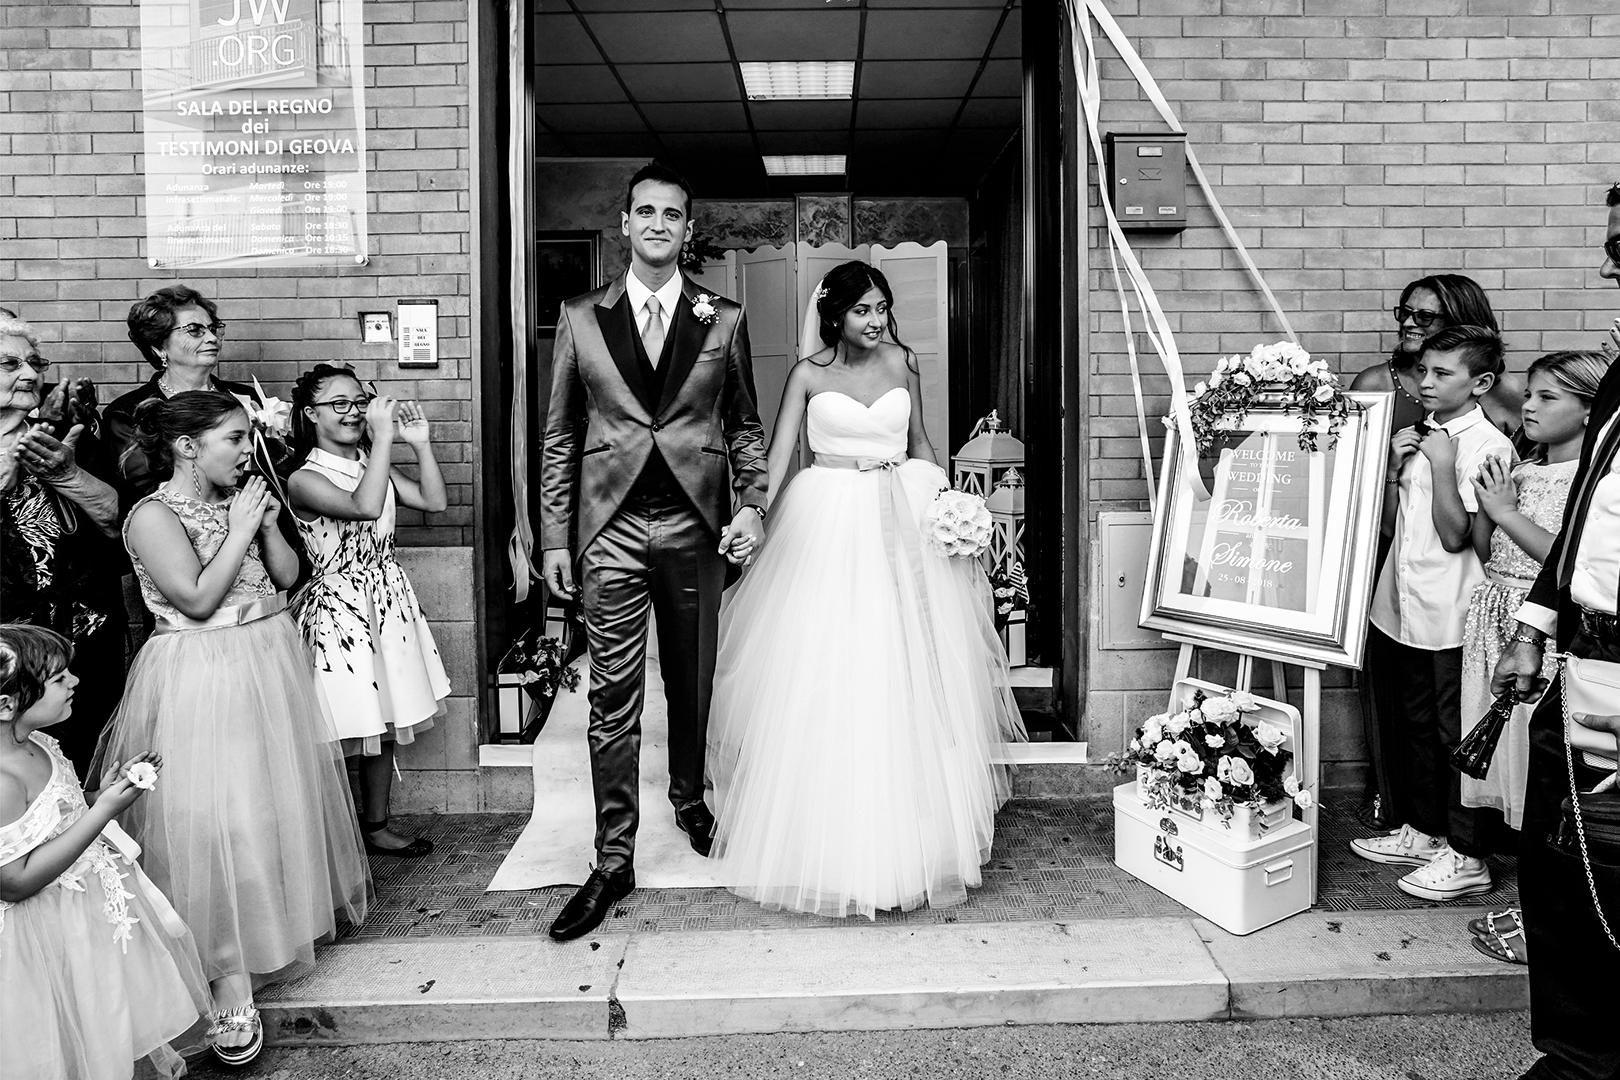 32 gianni-lepore-uscita-sala-regno-lucera-sposi-bride-groom